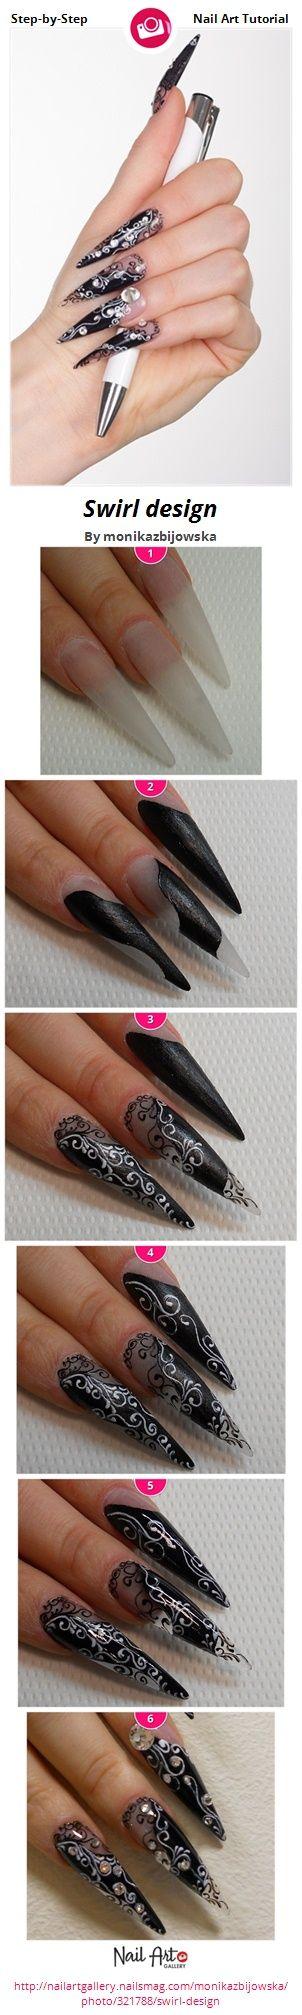 Swirl design by monikazbijowska - Nail Art Gallery Step-by-Step Tutorials nailartgallery.nailsmag.com by Nails Magazine www.nailsmag.com #nailart